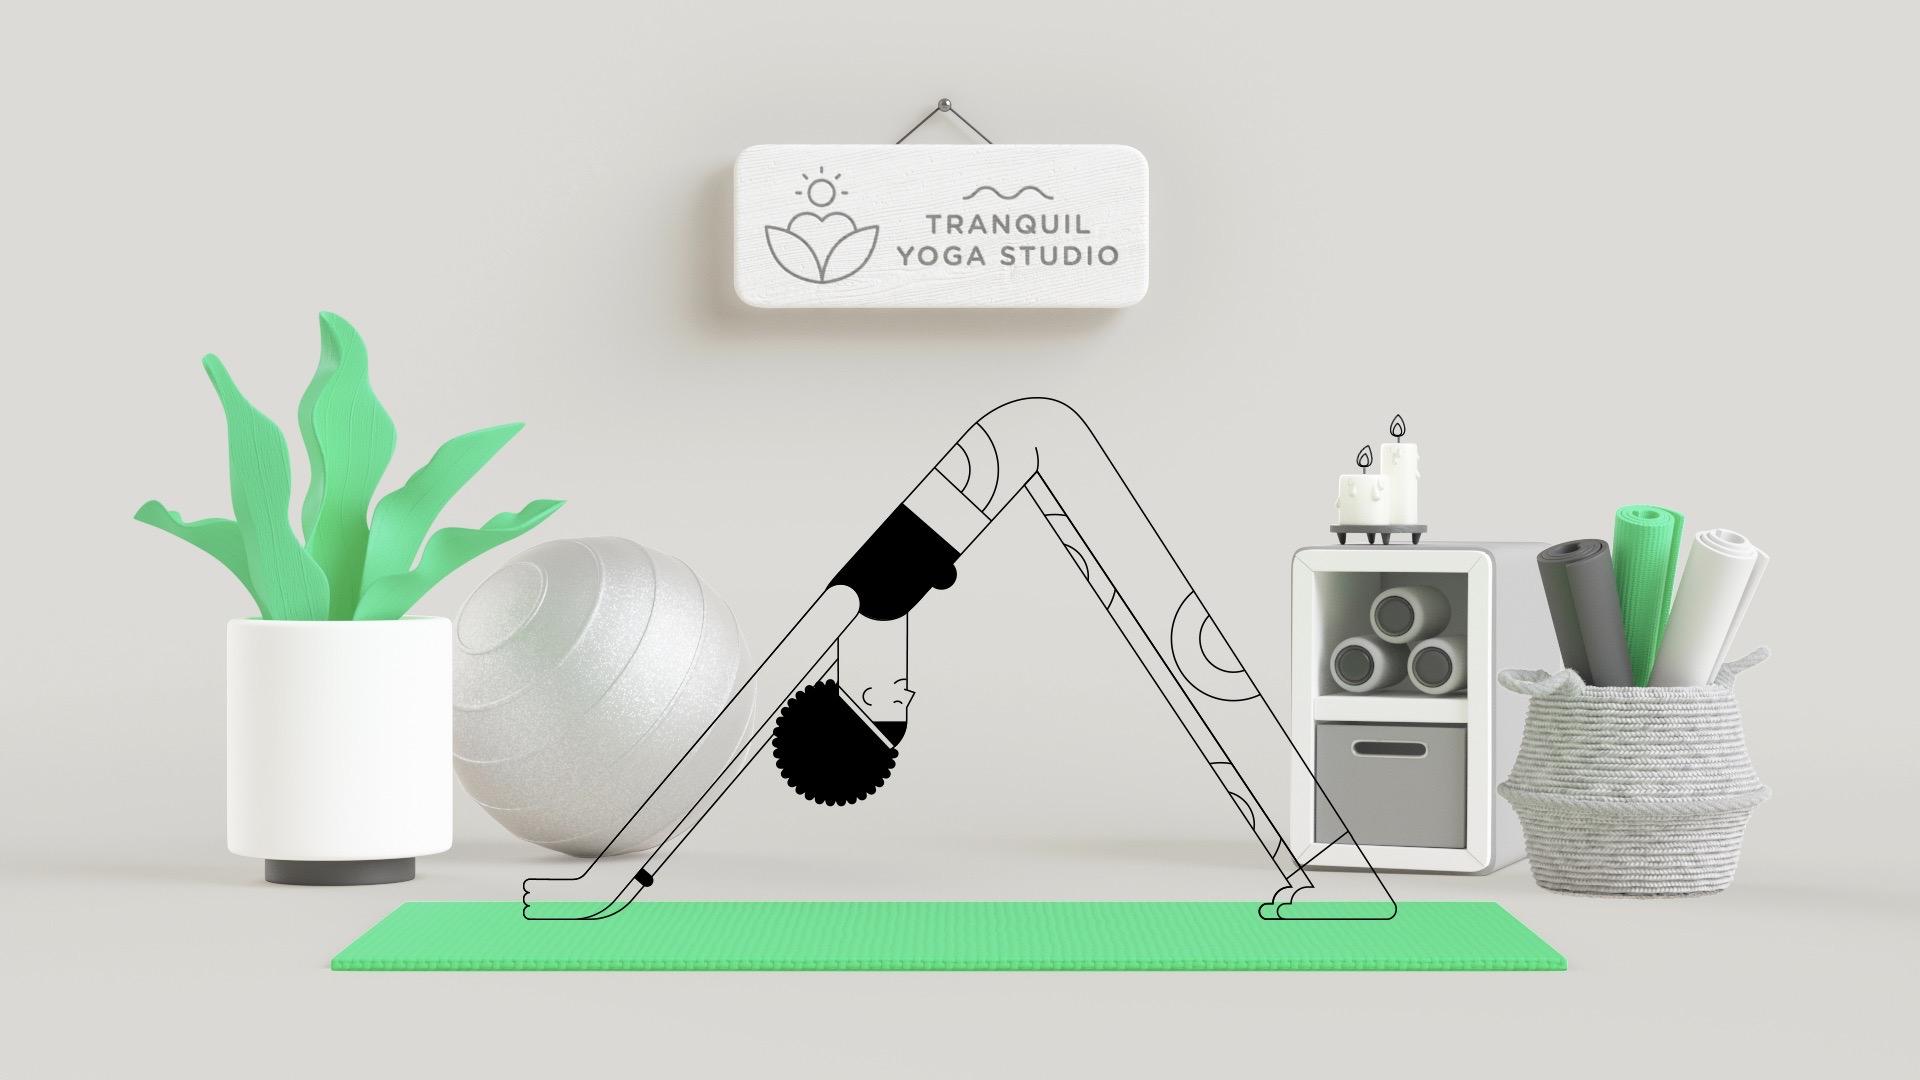 cartoon character doing yoga on a green mat.